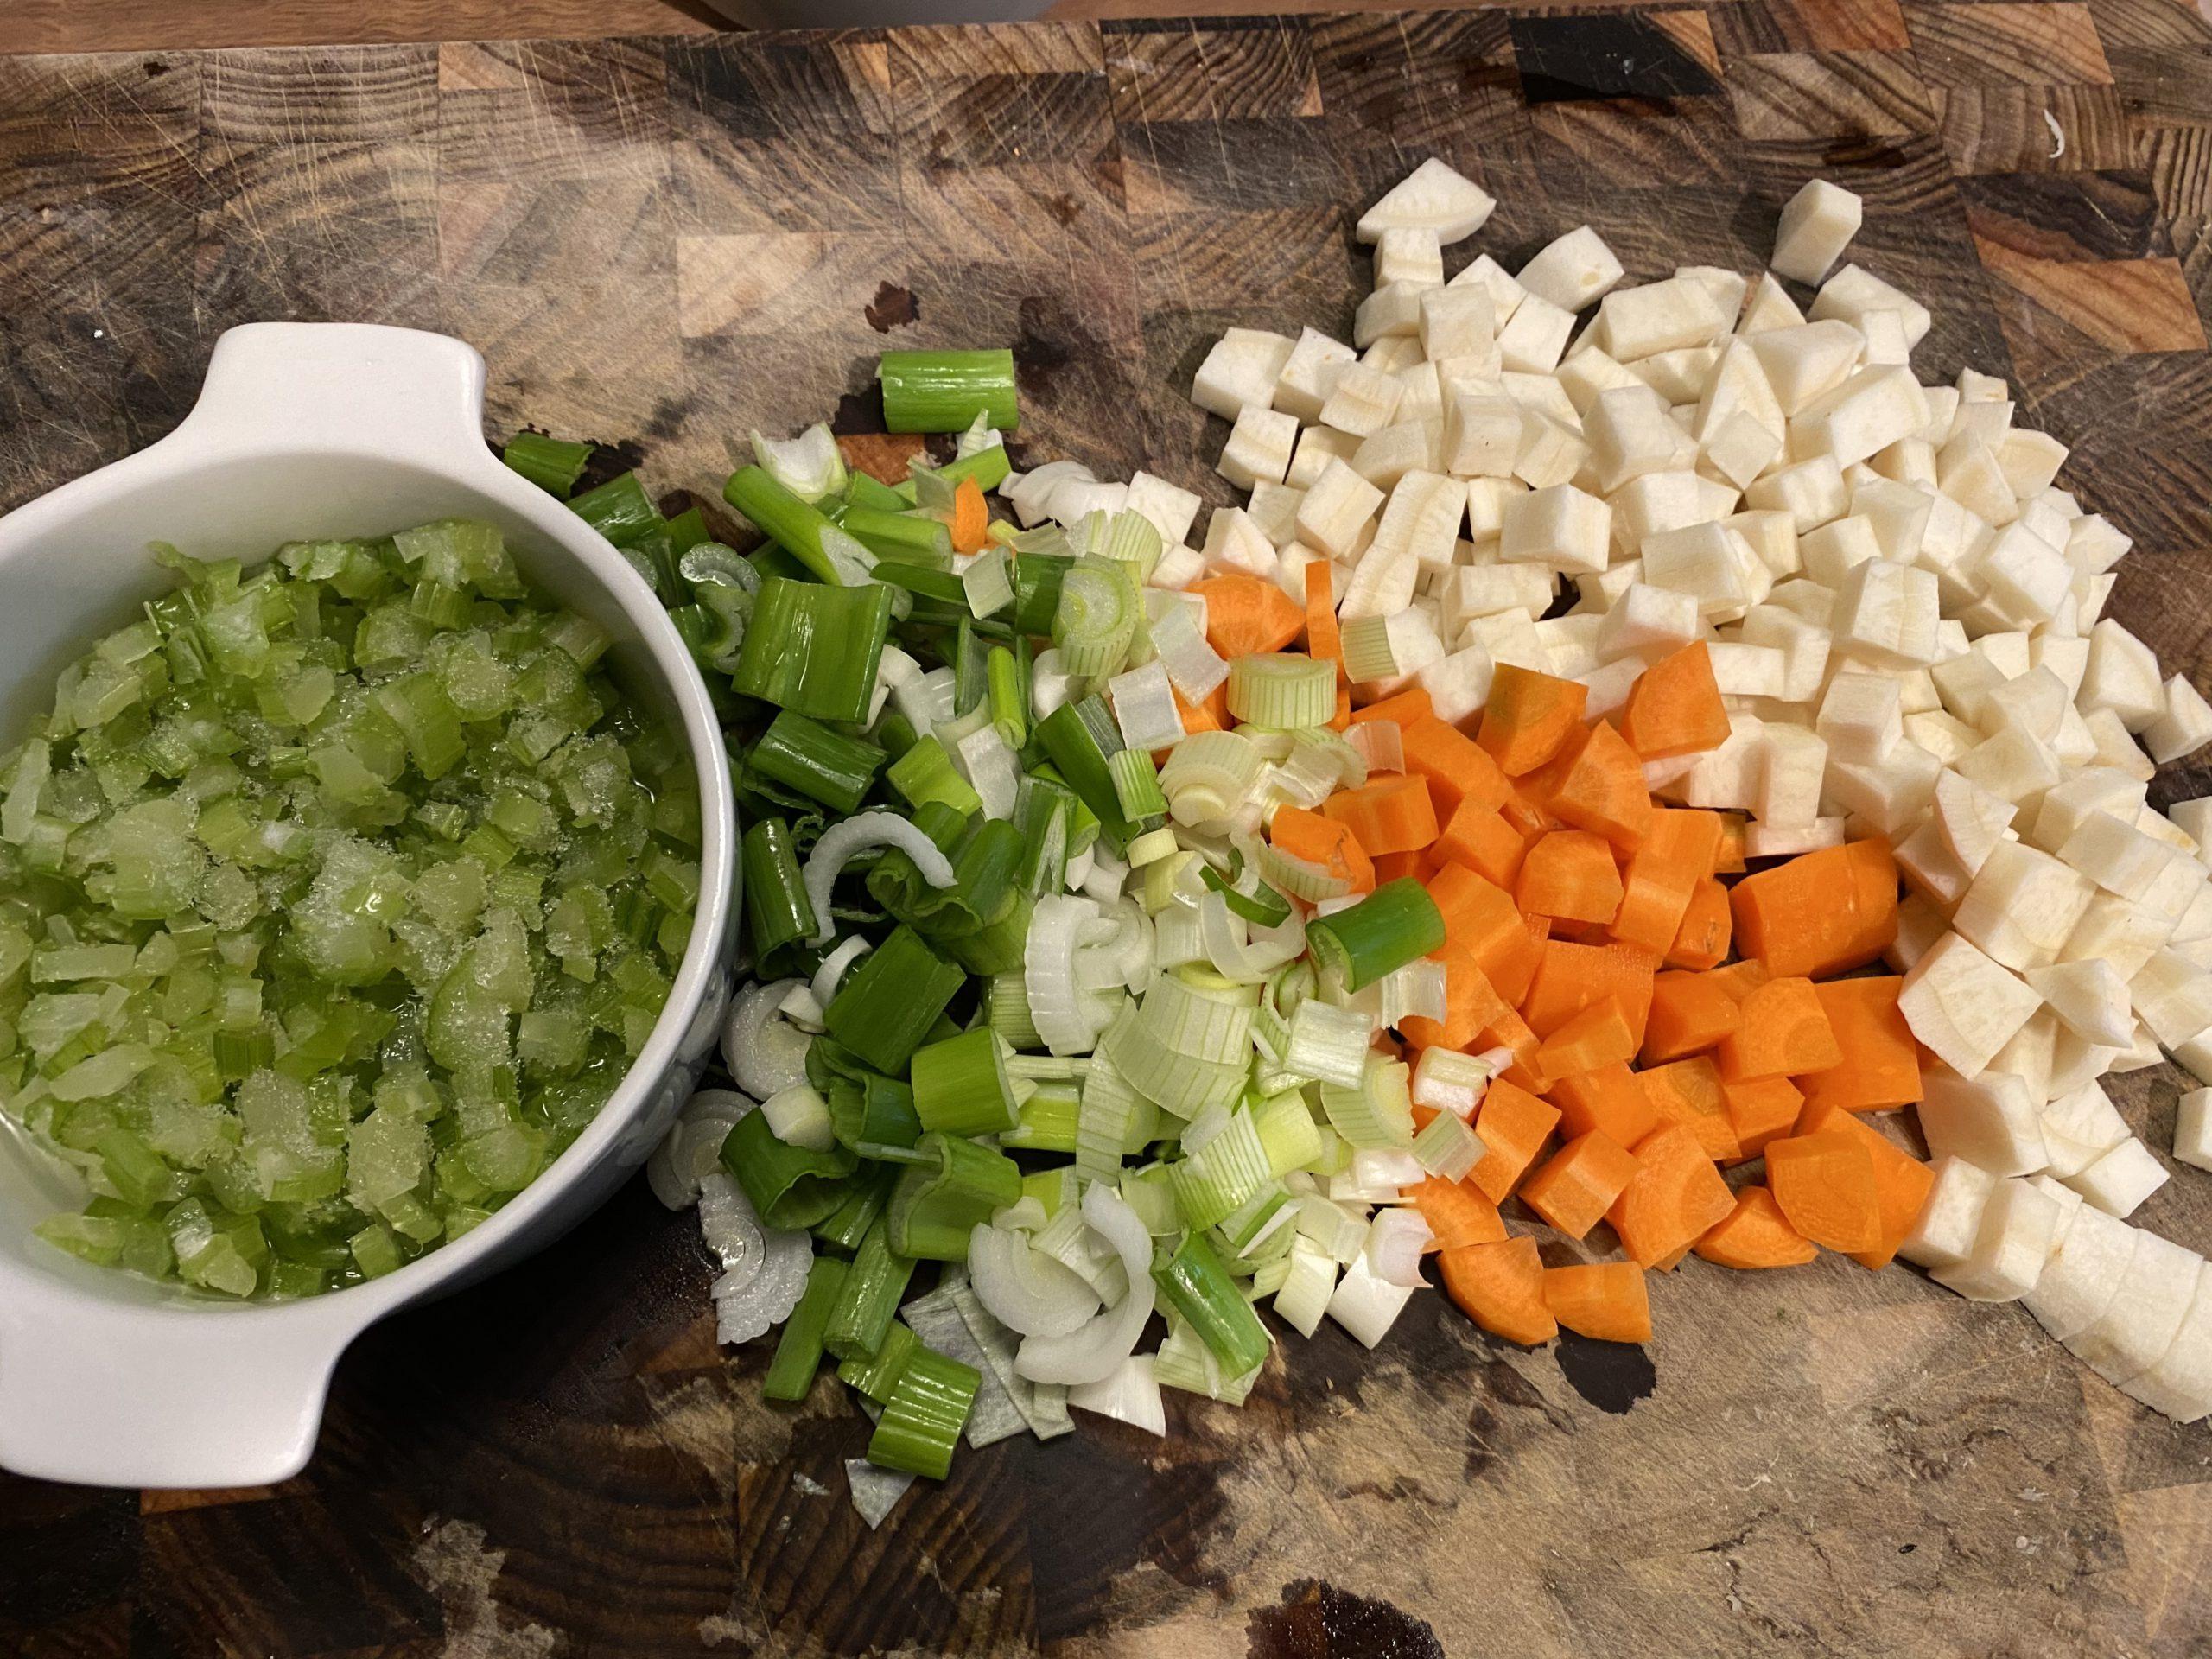 Prepping veg